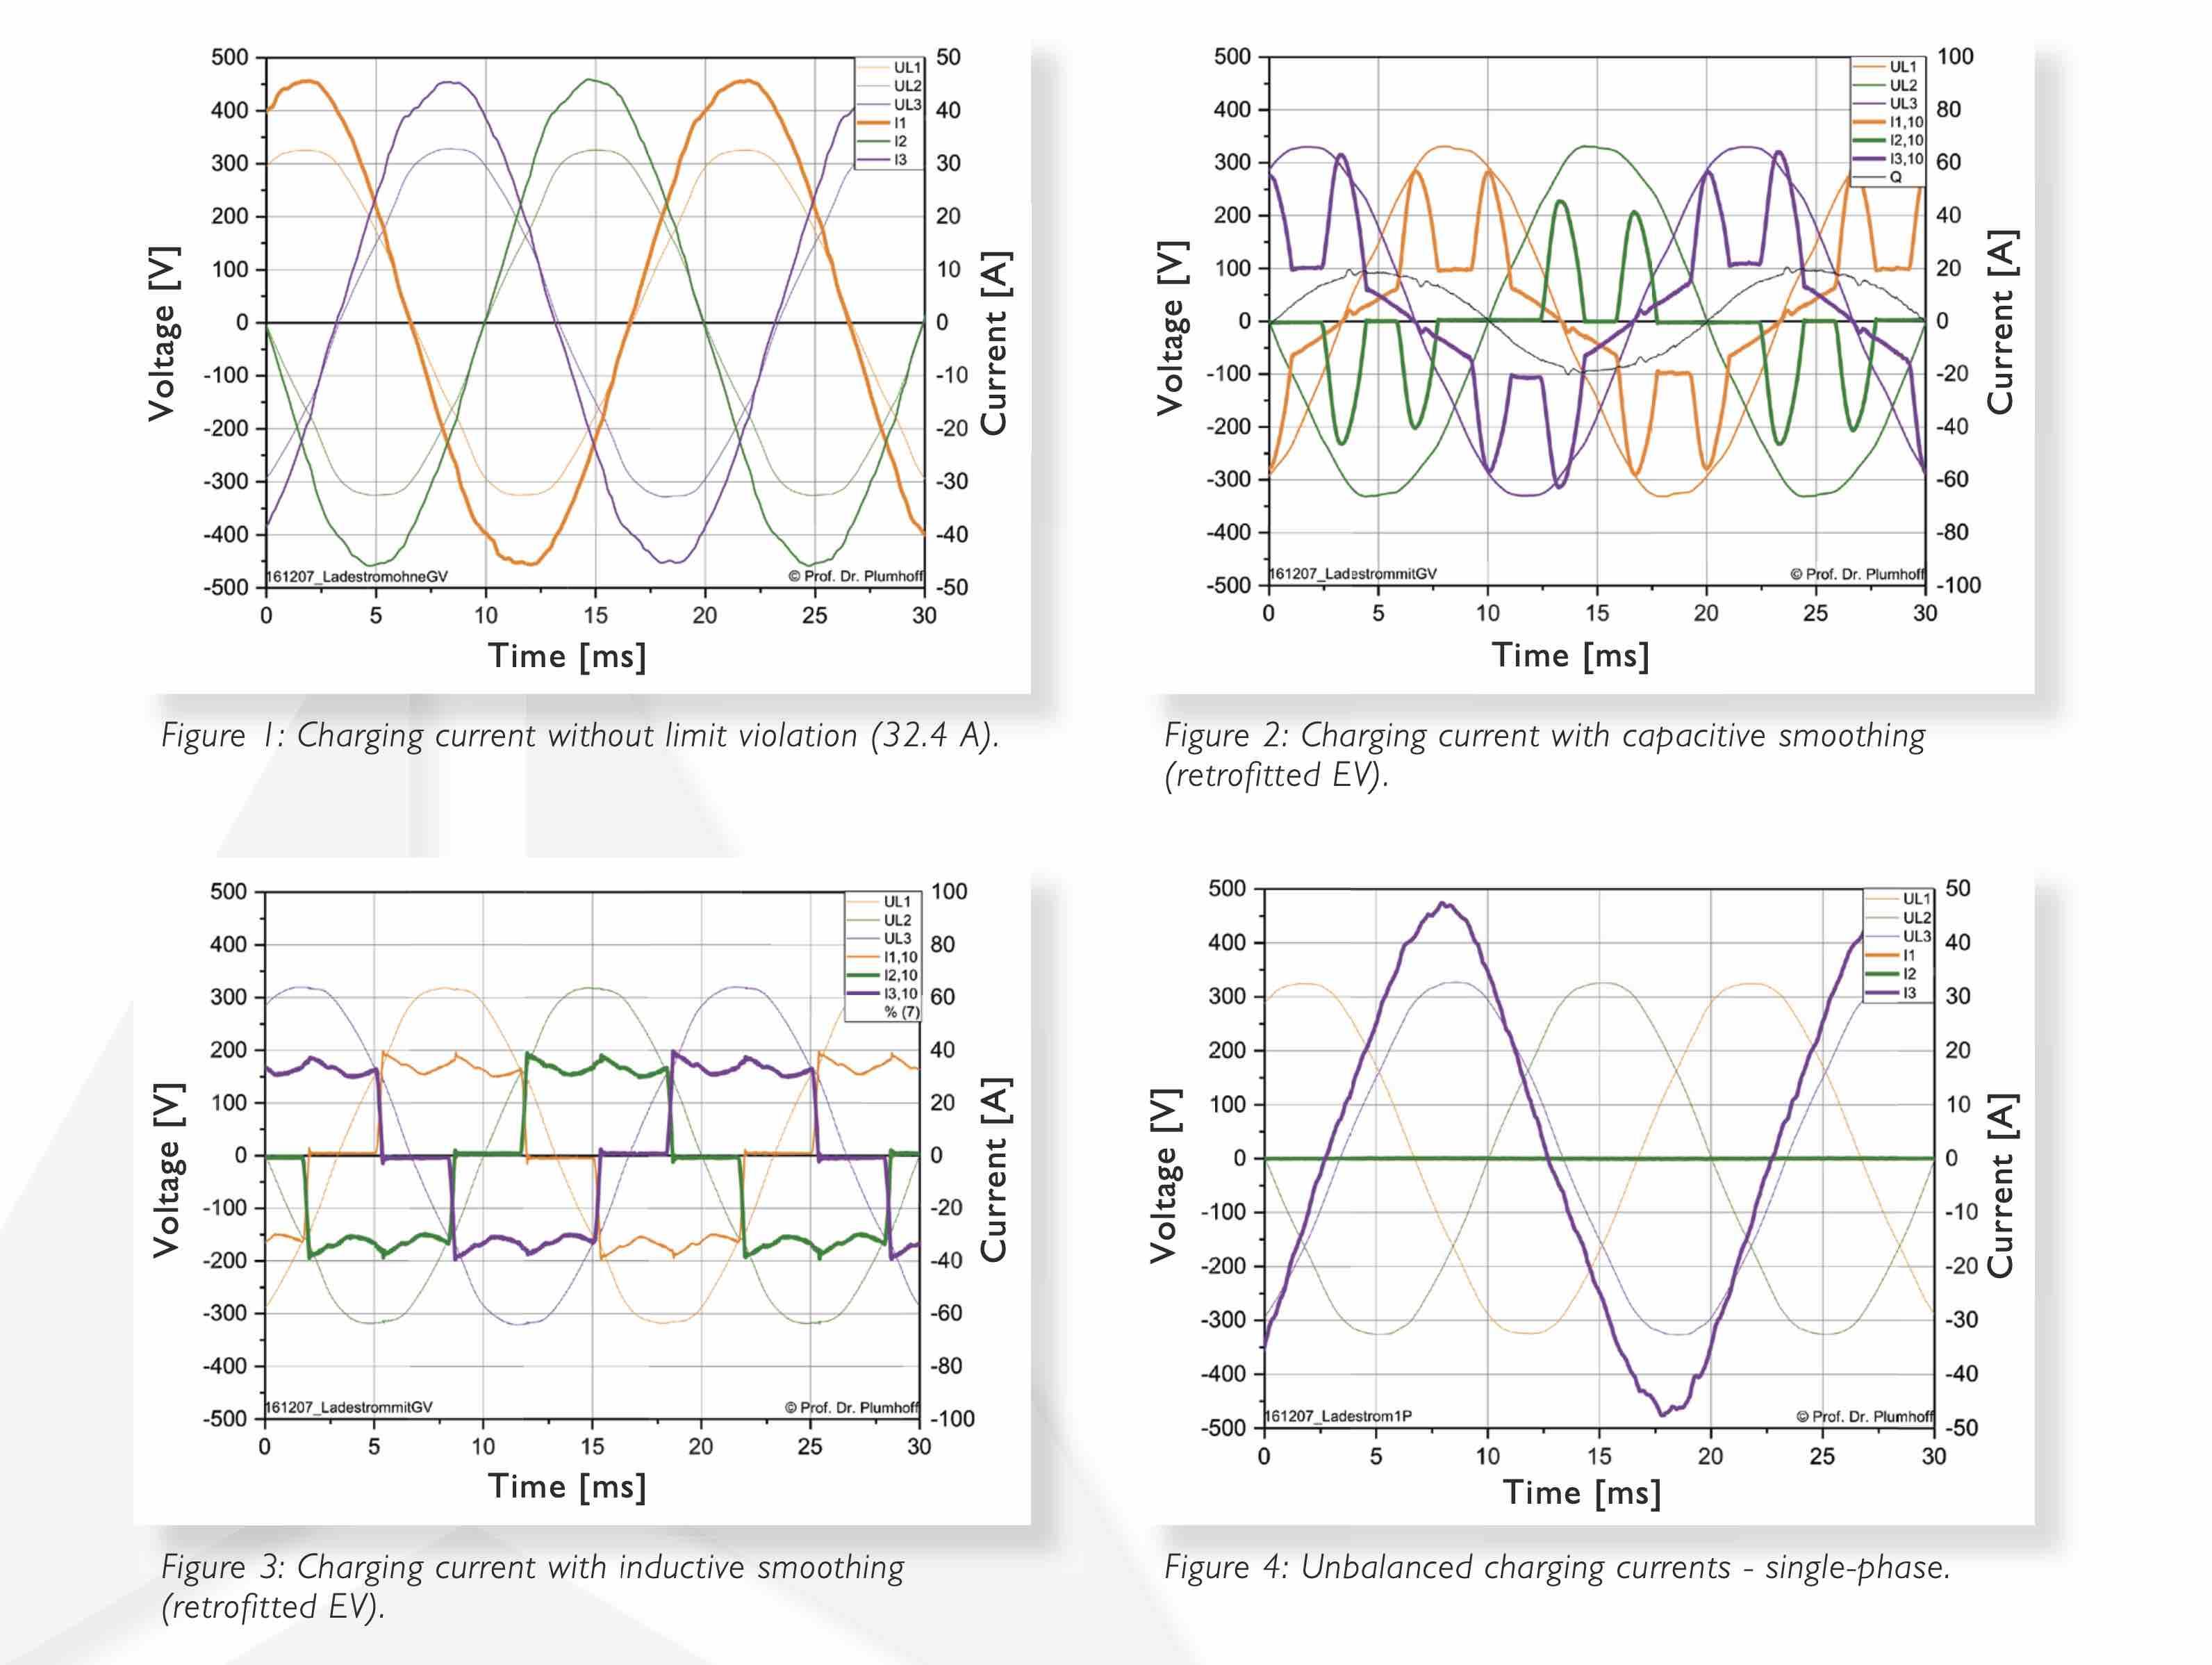 power quality, a-eberle, charging cars, supraharmonic, harmonics of voltage, harmonics of current, switching peaks